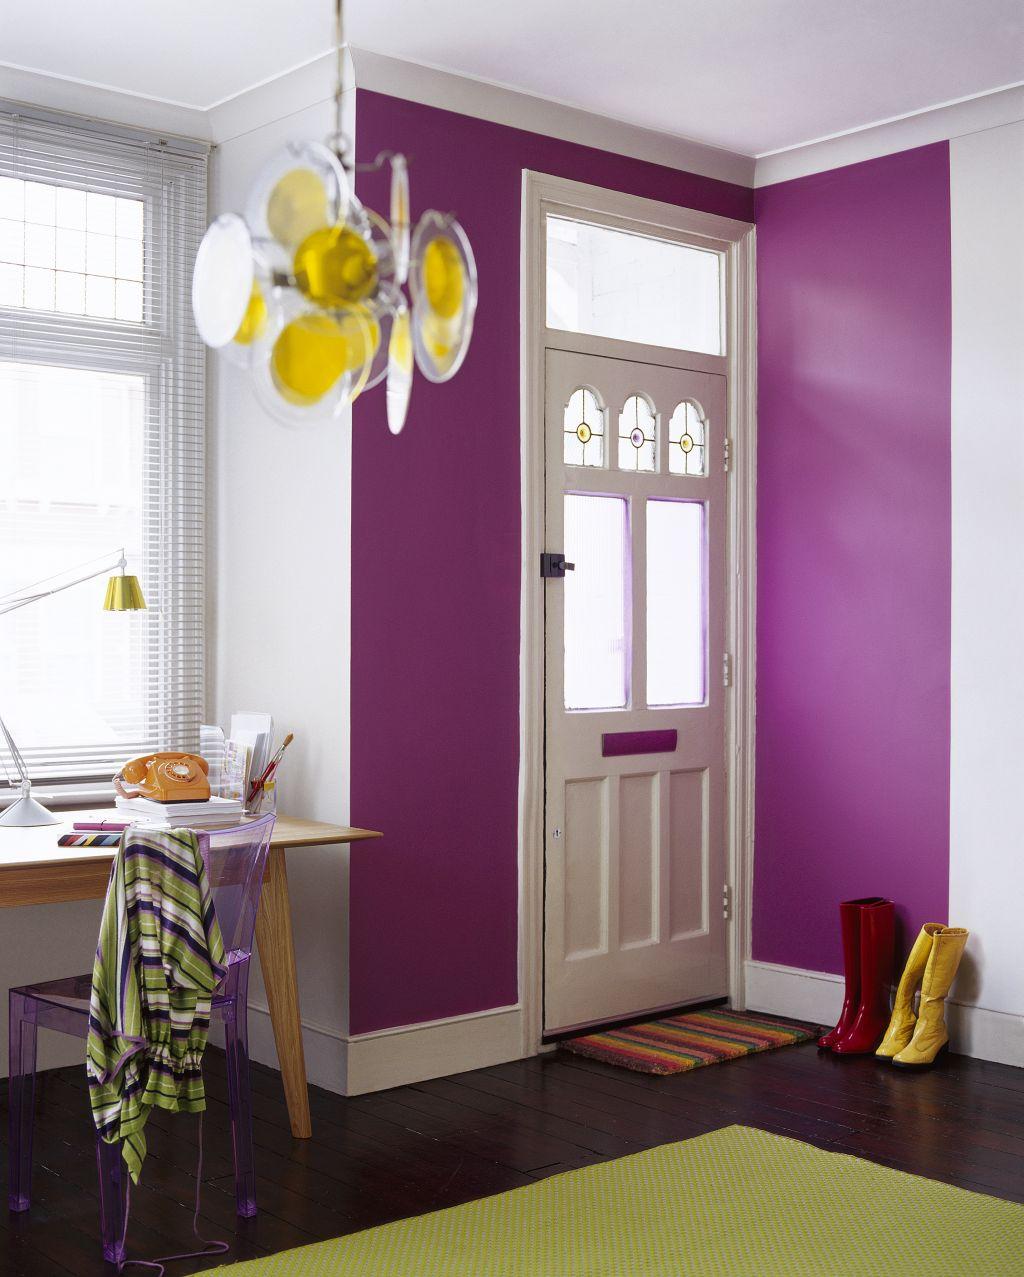 Folosit in zone de impact violet transforma atmosfera. Nuanta ce merge perfect cu wenge Foto Copyright © Akzo Nobel